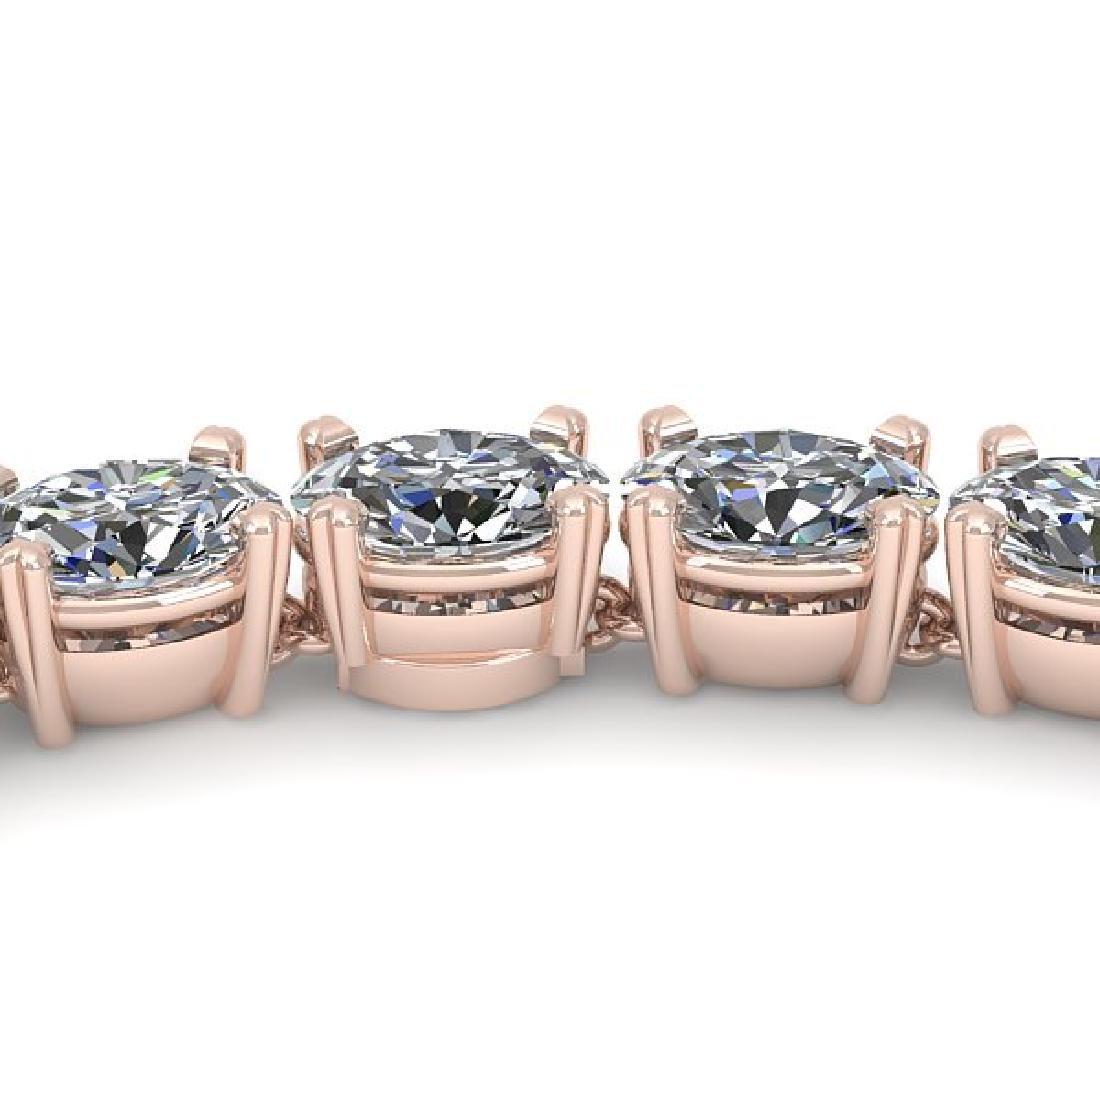 35 CTW Oval Cut Certified SI Diamond Necklace 14K Rose